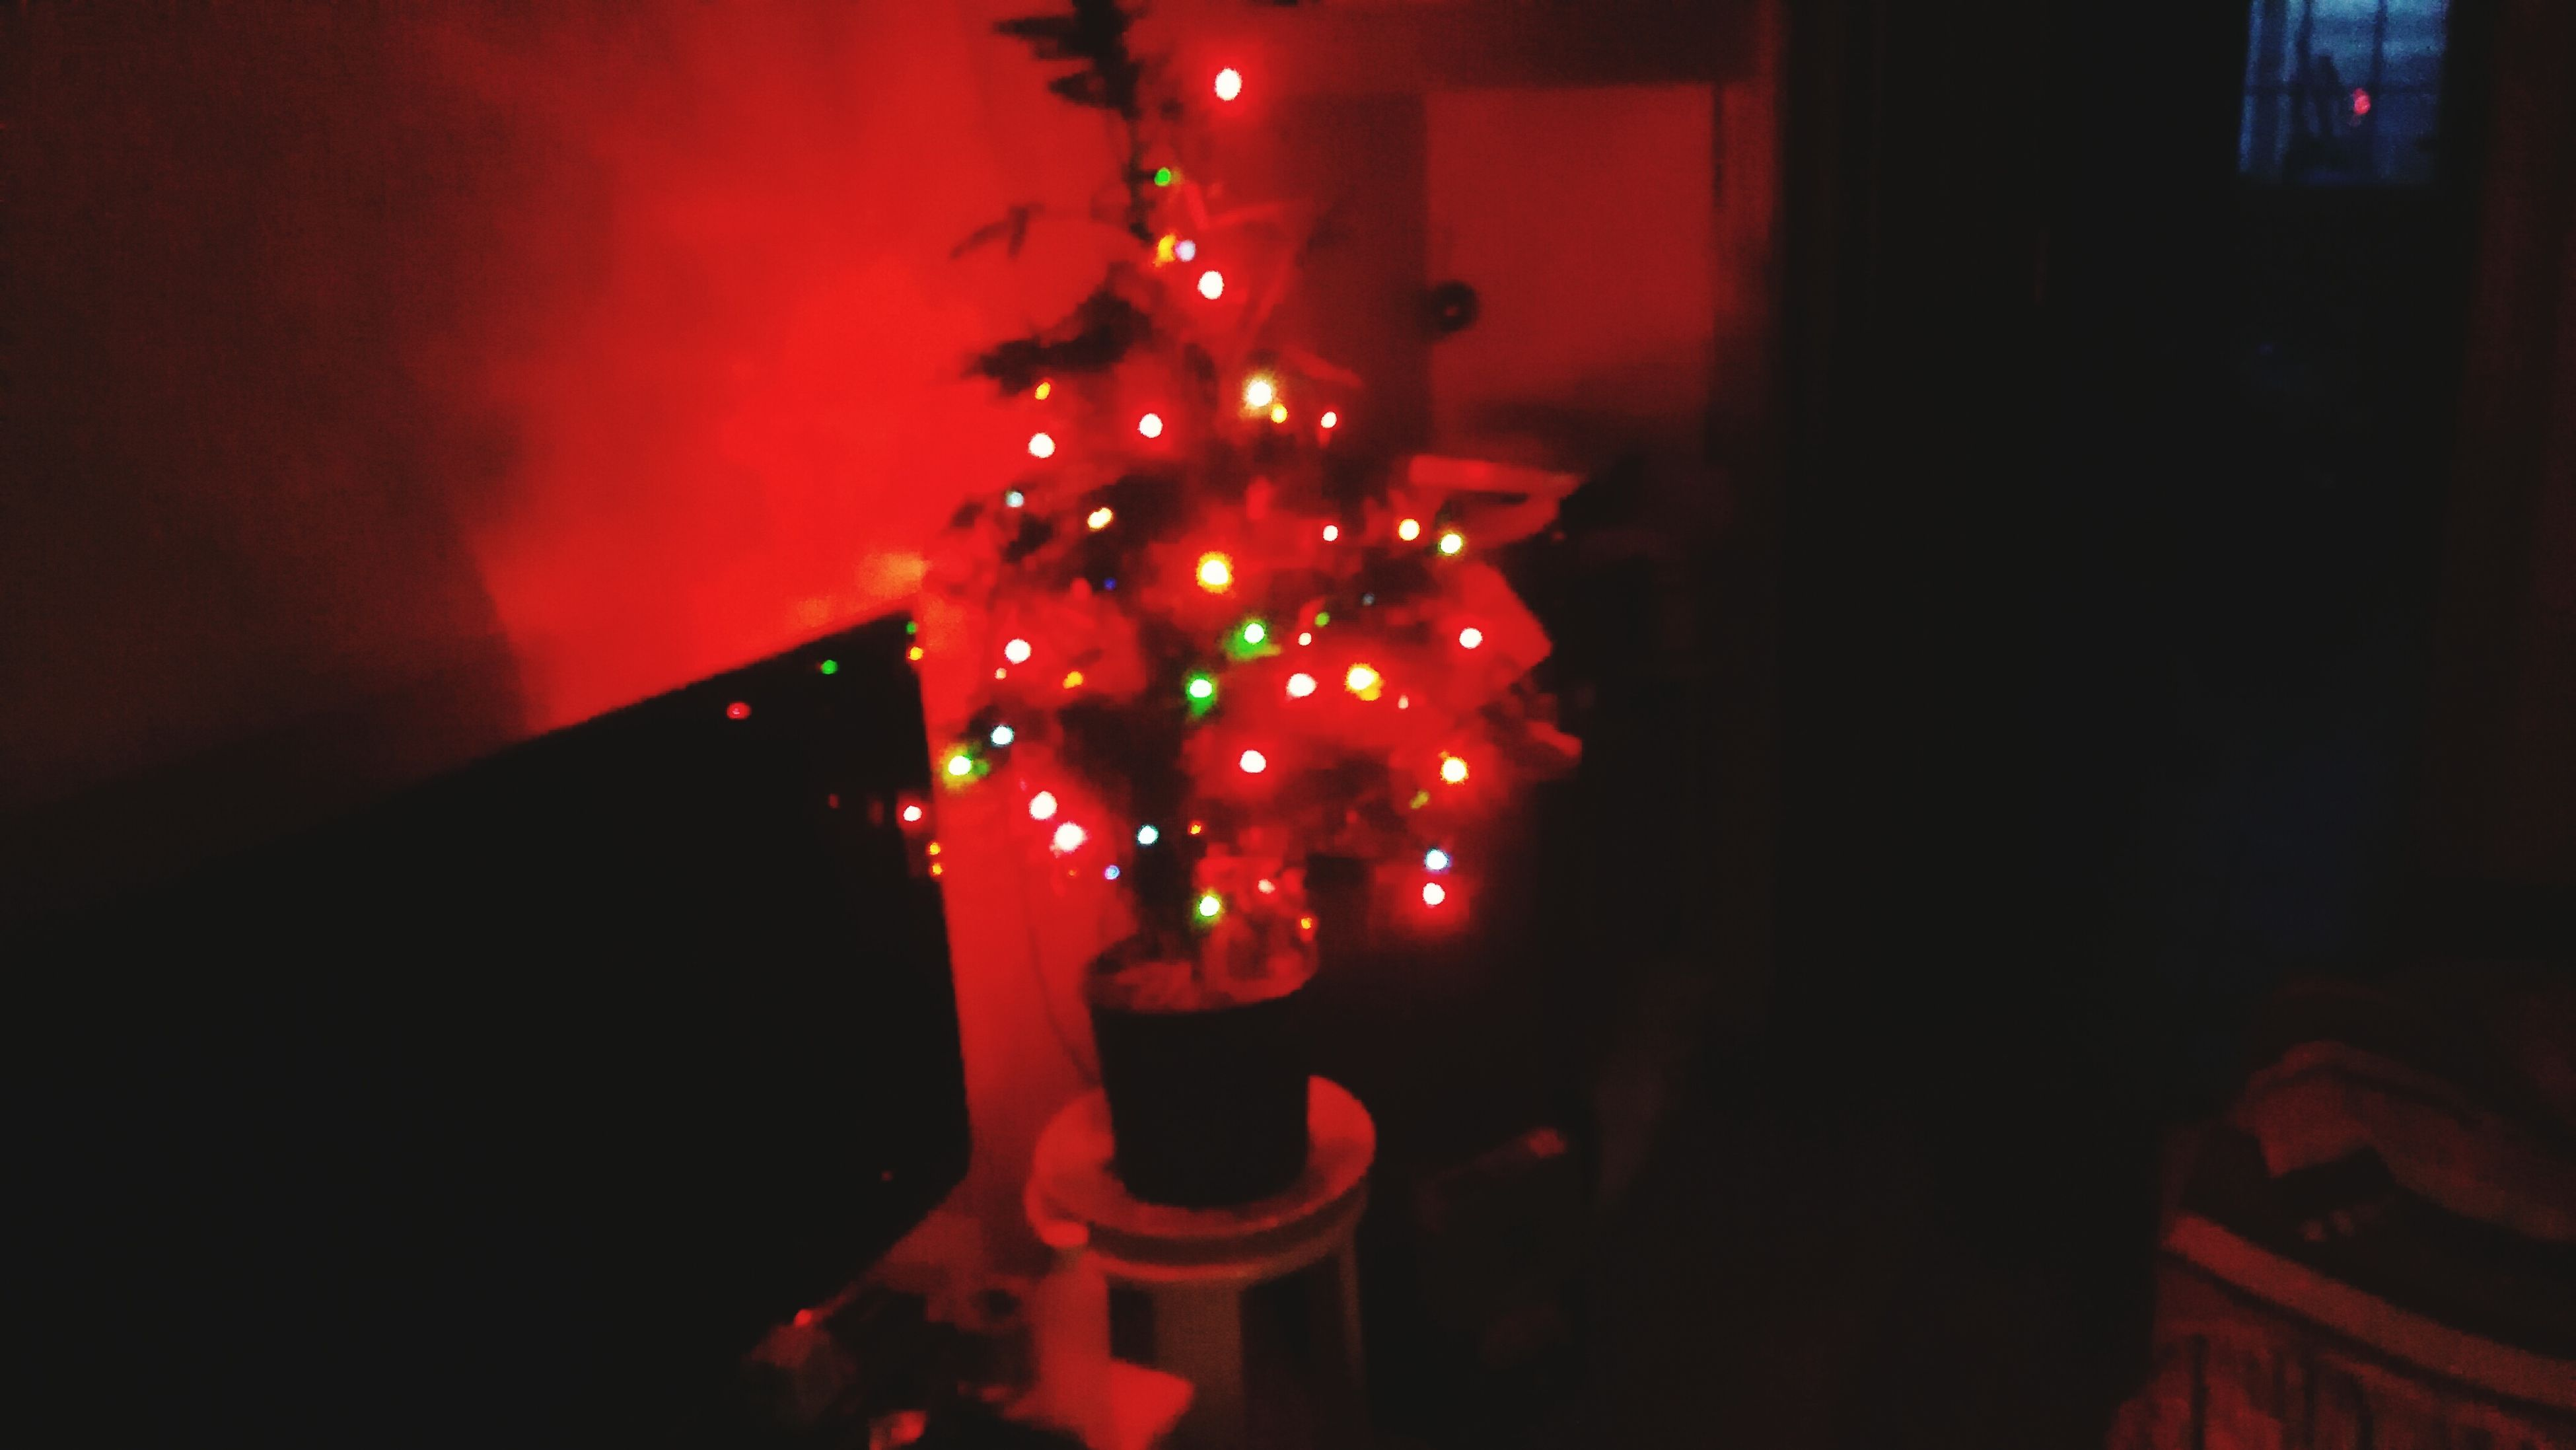 illuminated, indoors, red, lighting equipment, night, celebration, decoration, glowing, candle, light - natural phenomenon, hanging, lit, burning, dark, tradition, electric light, low angle view, light, flame, lantern